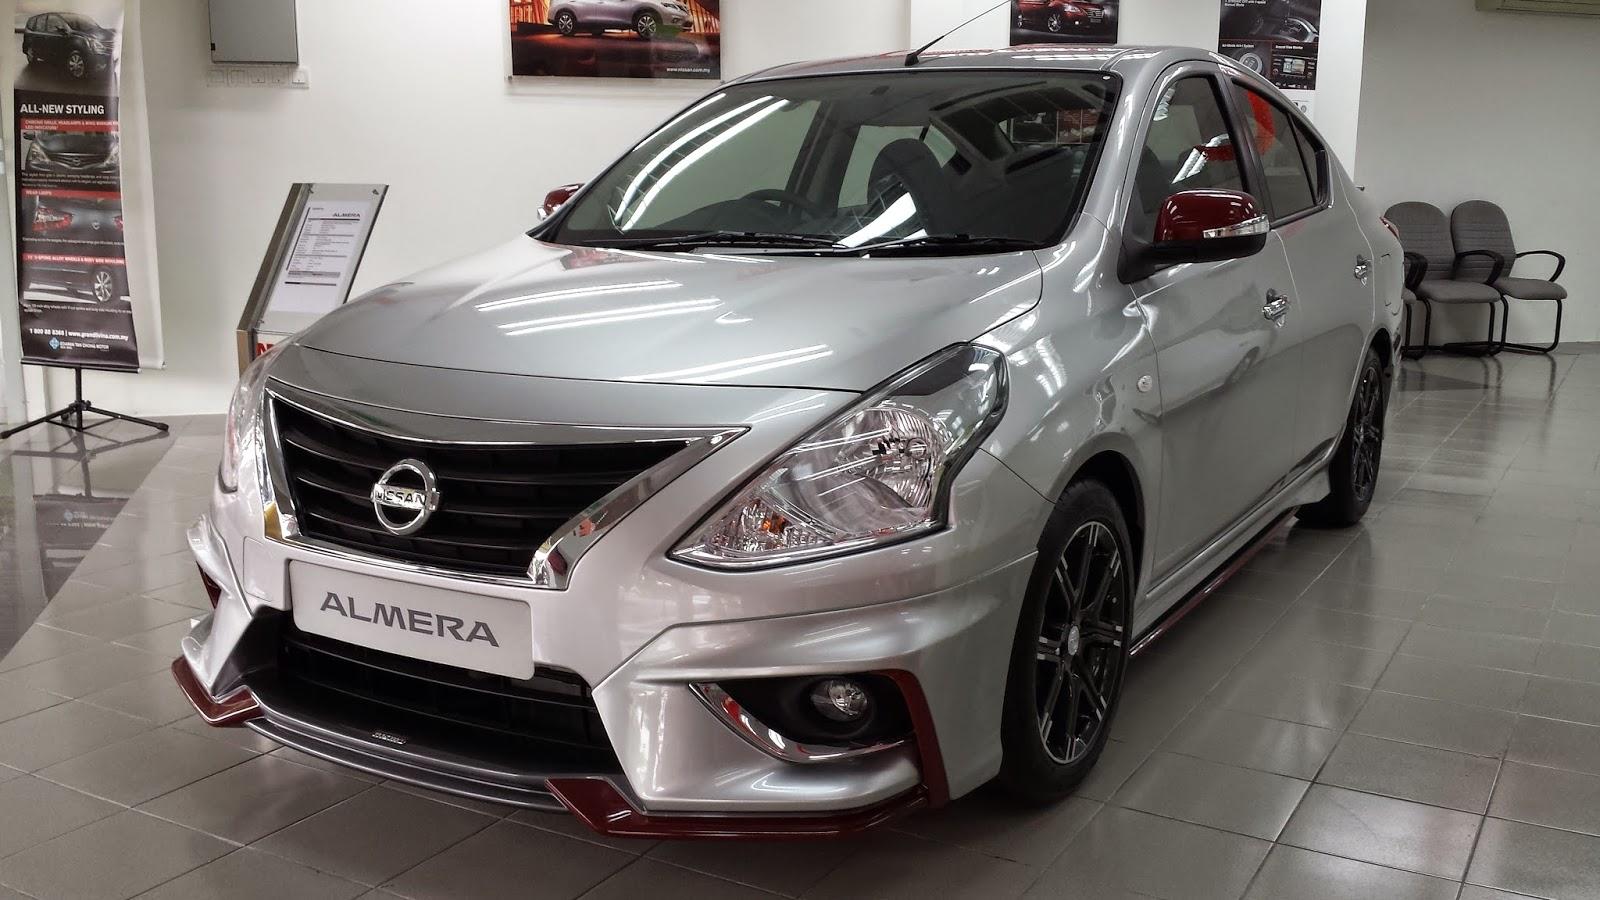 The Layman Auto: Nissan Almera, the no-frills Japanese car